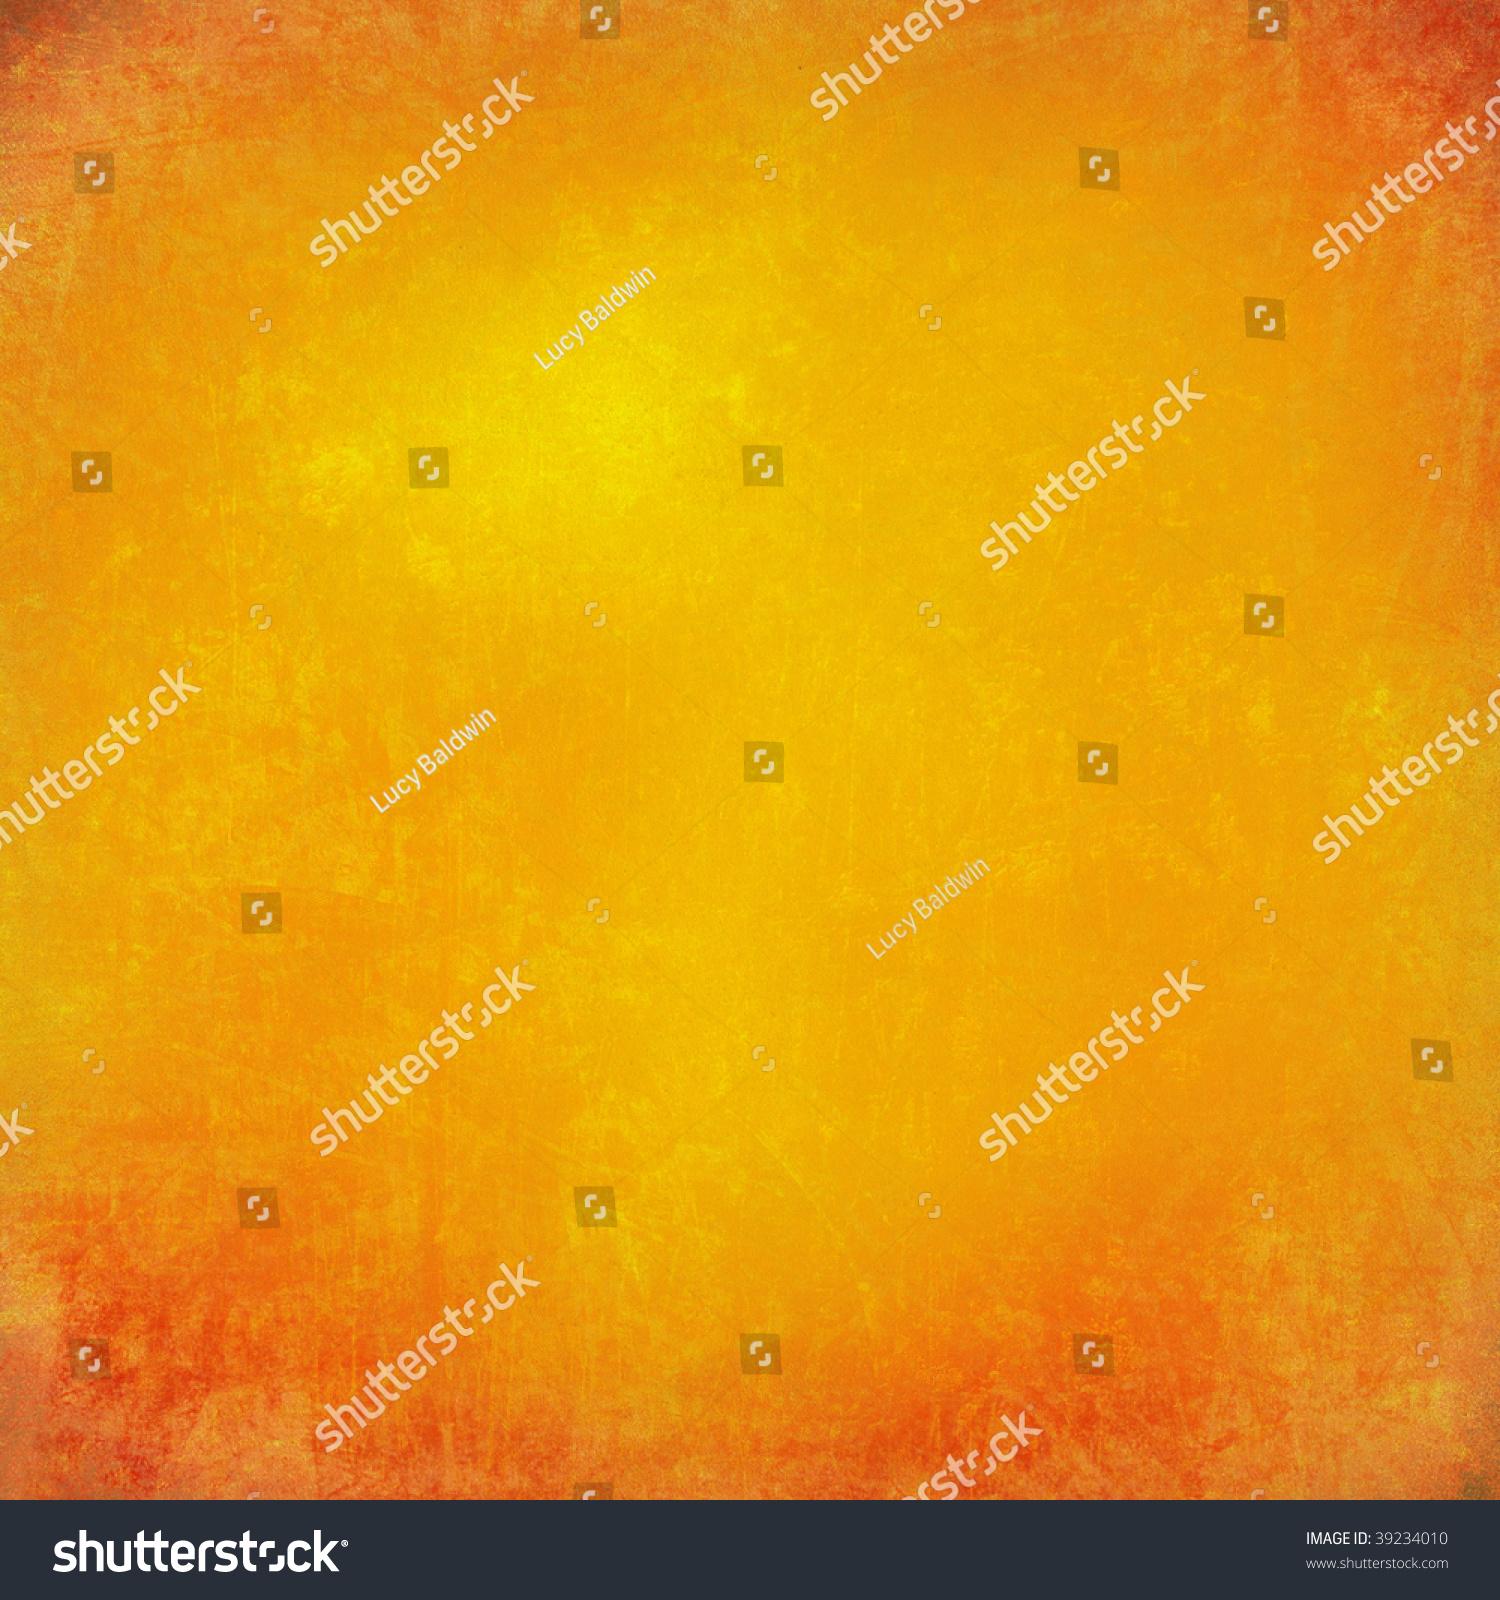 sunshine yellow deep texture - photo #2